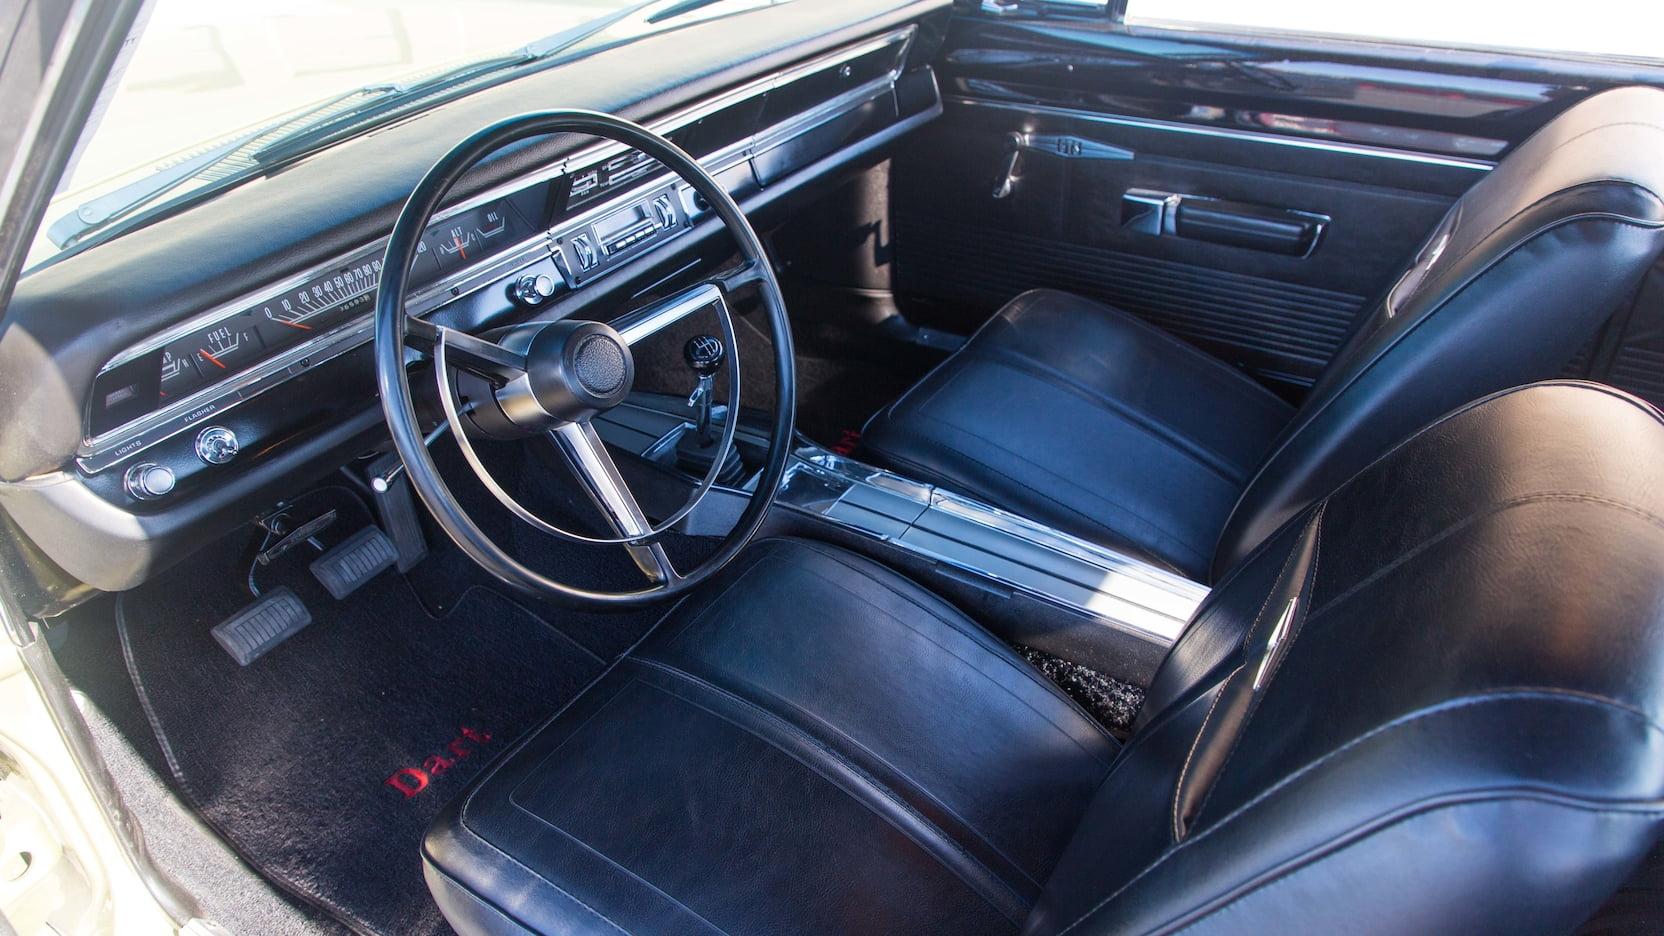 1968 Dodge Dart GTS Interior Front Dash